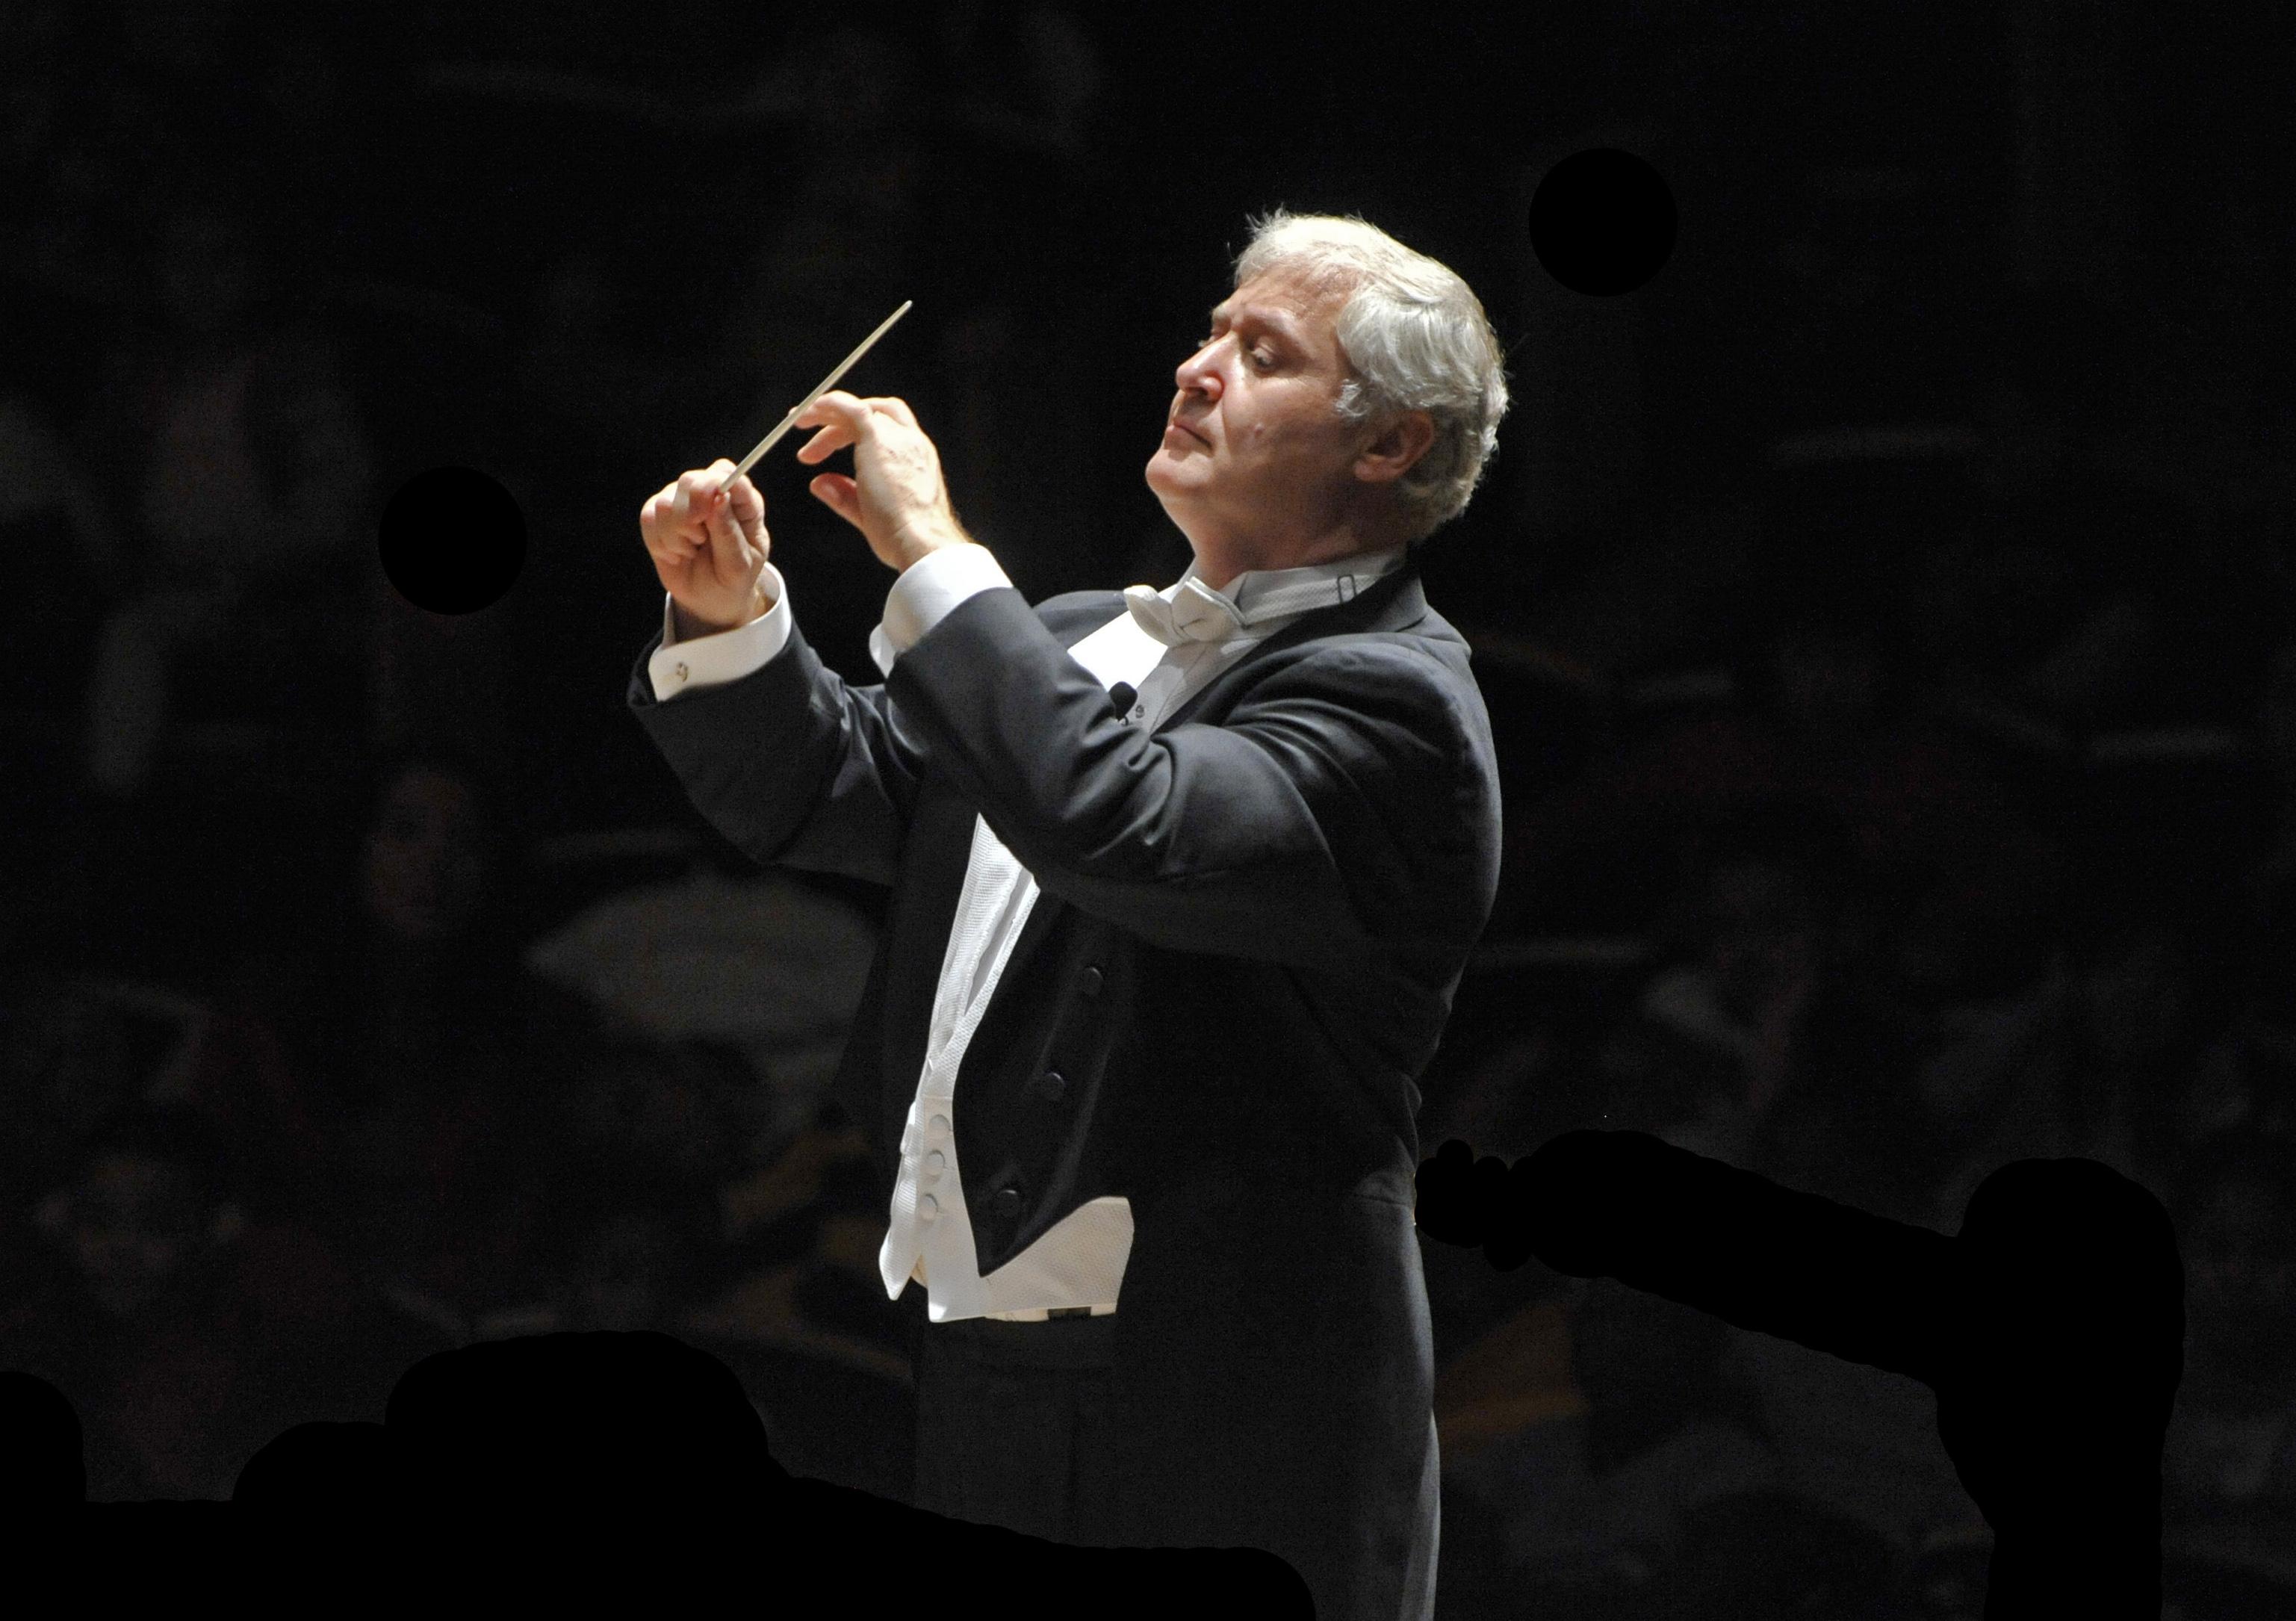 Maestro Piotr Gajewski conducts the National Philharmonic Orchestra.